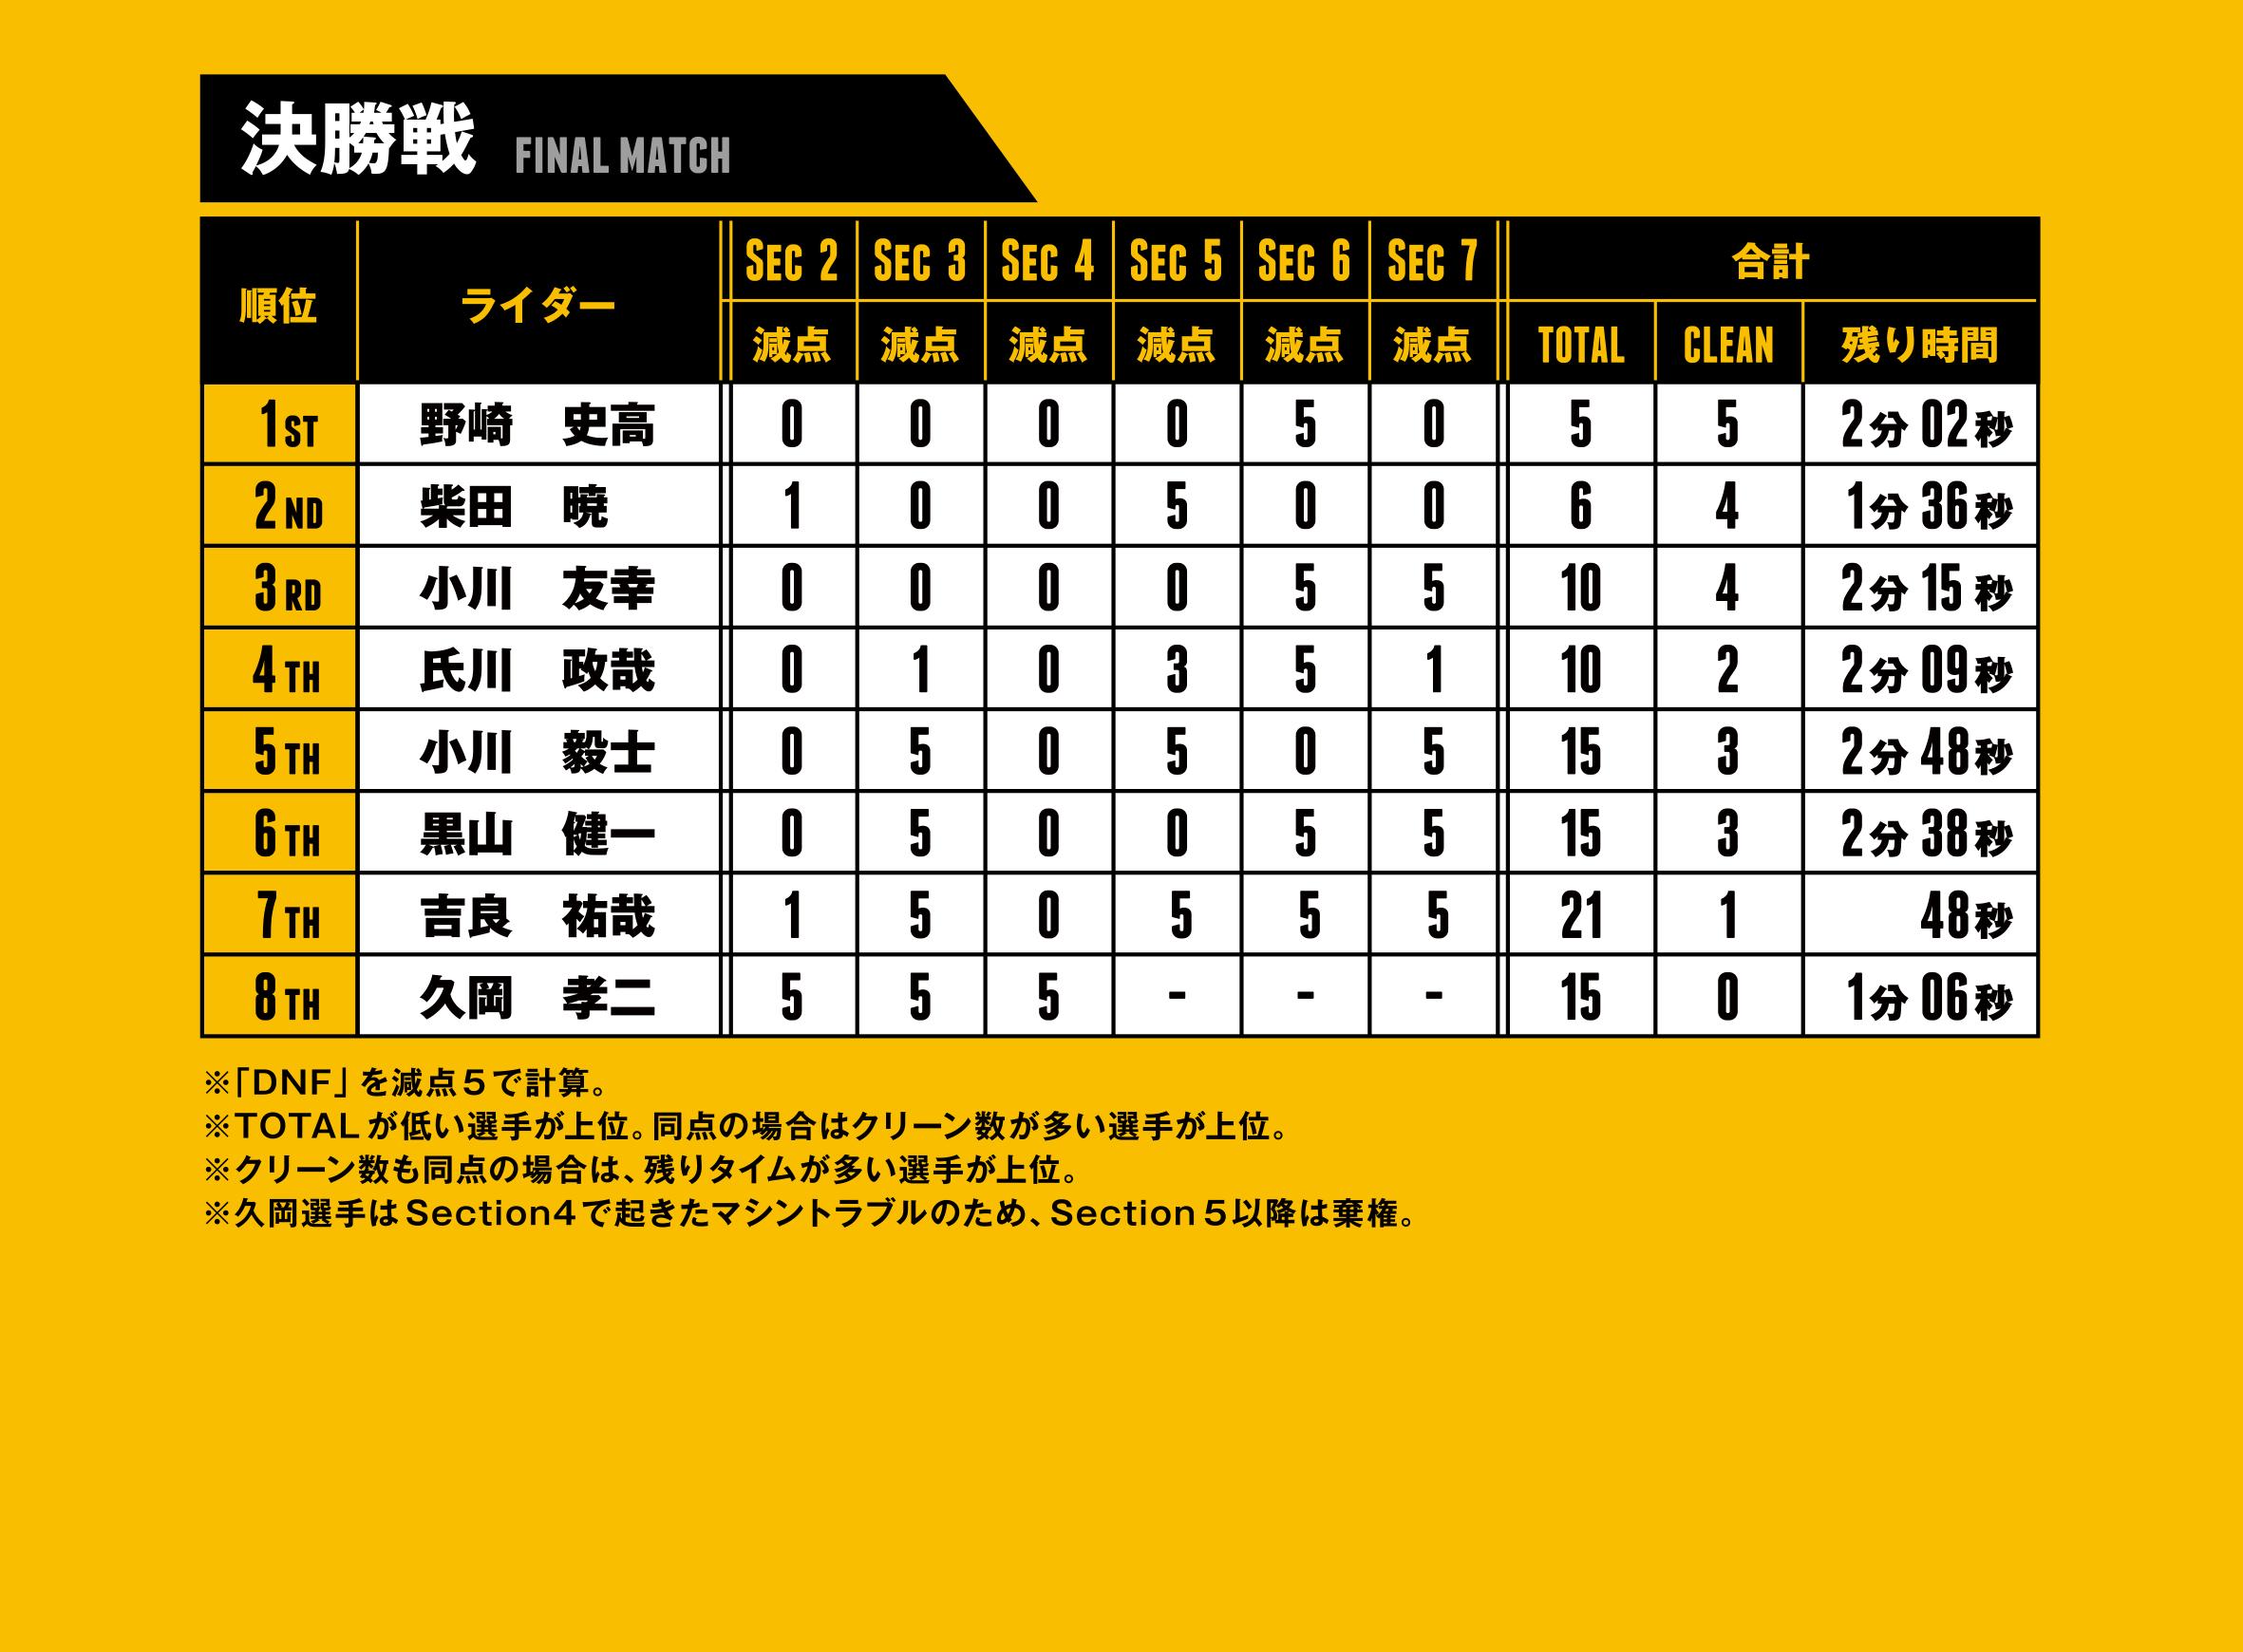 ctj2019 final match